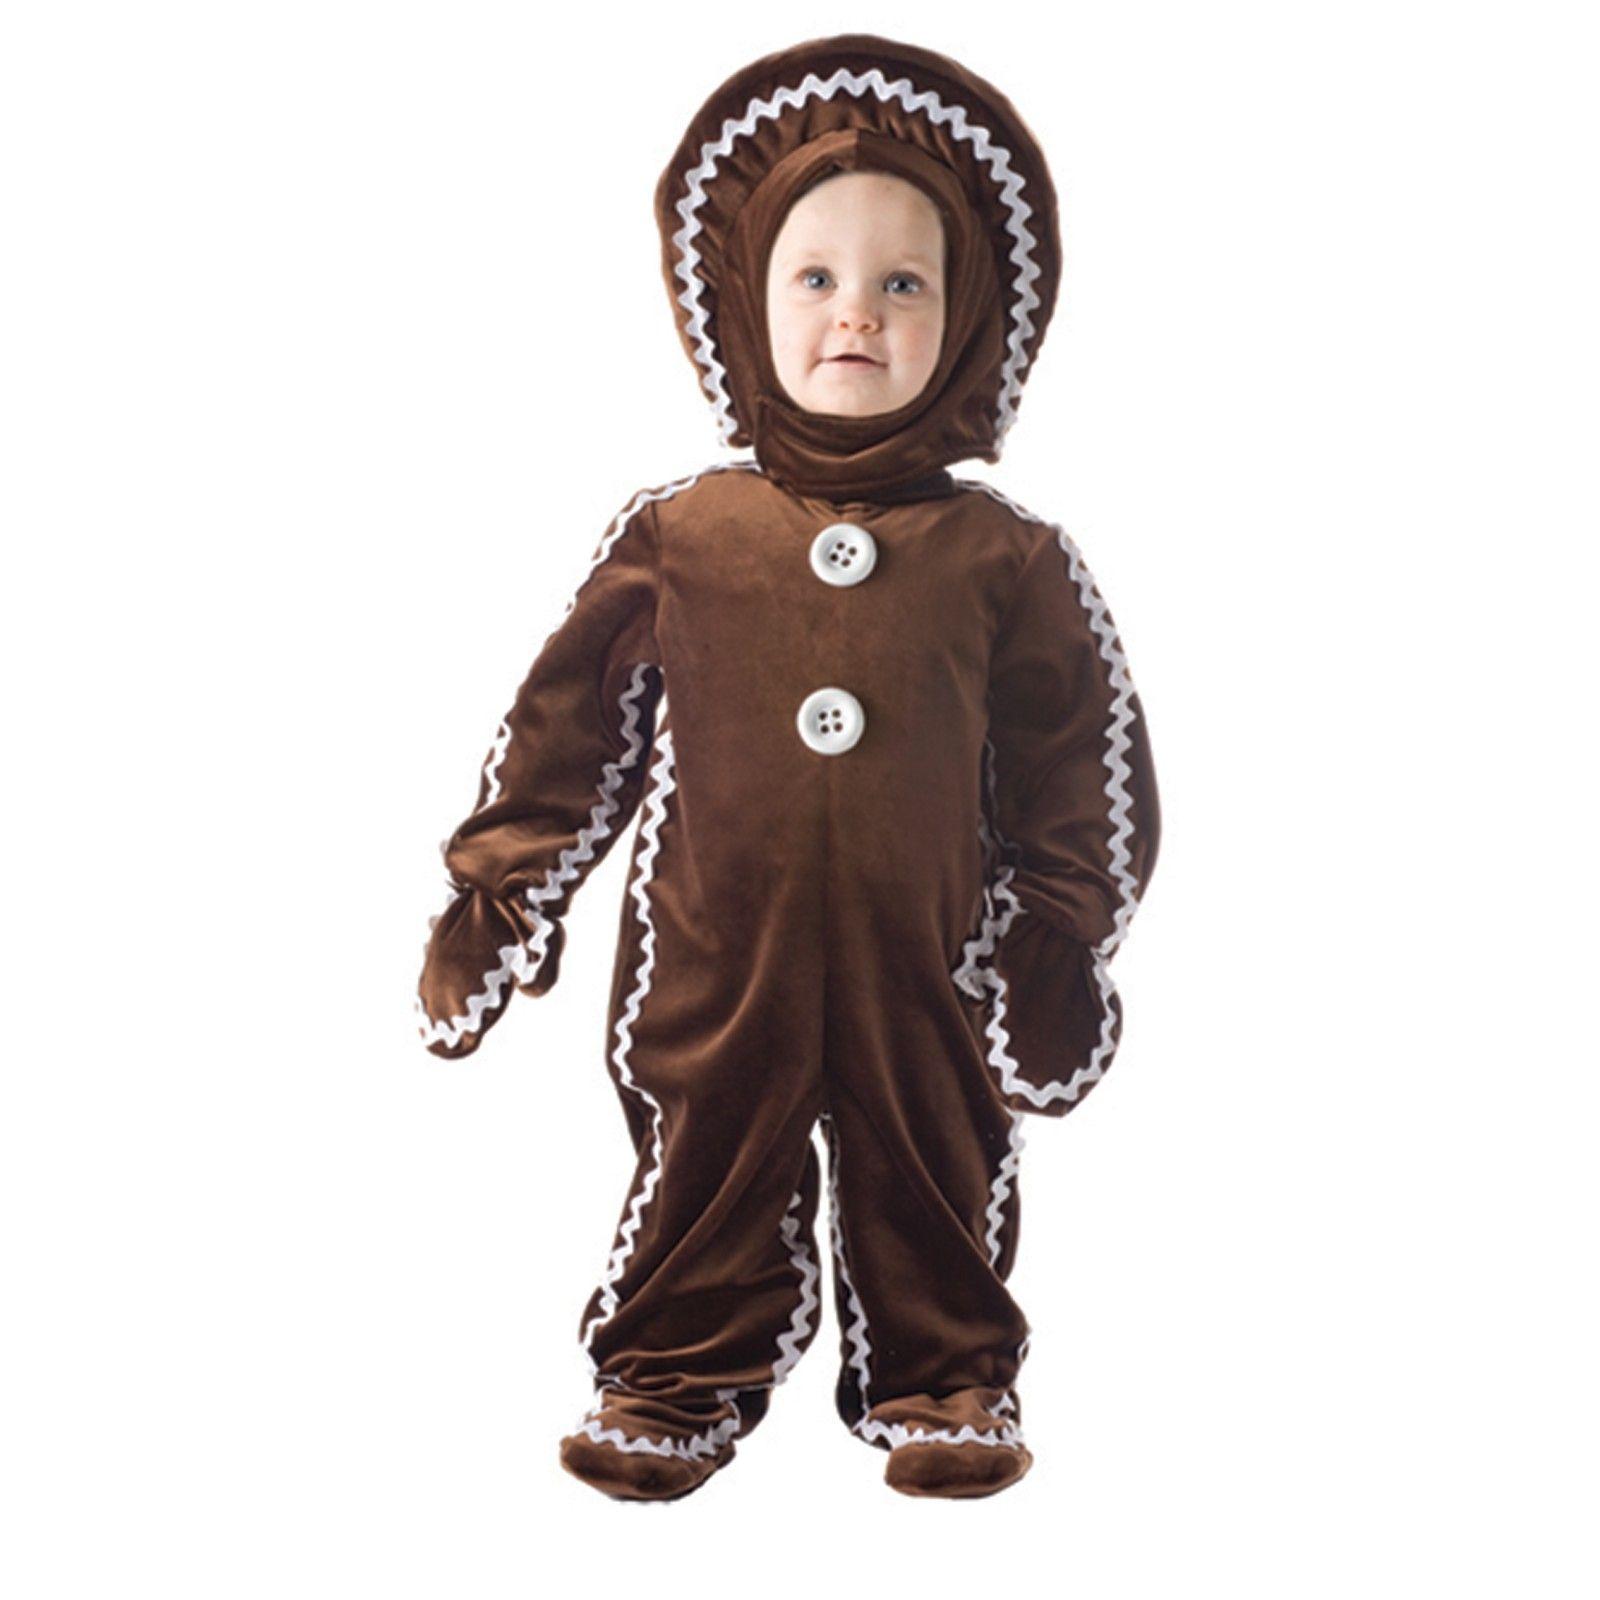 Candyland Child Gingerbread man costumes, Toddler